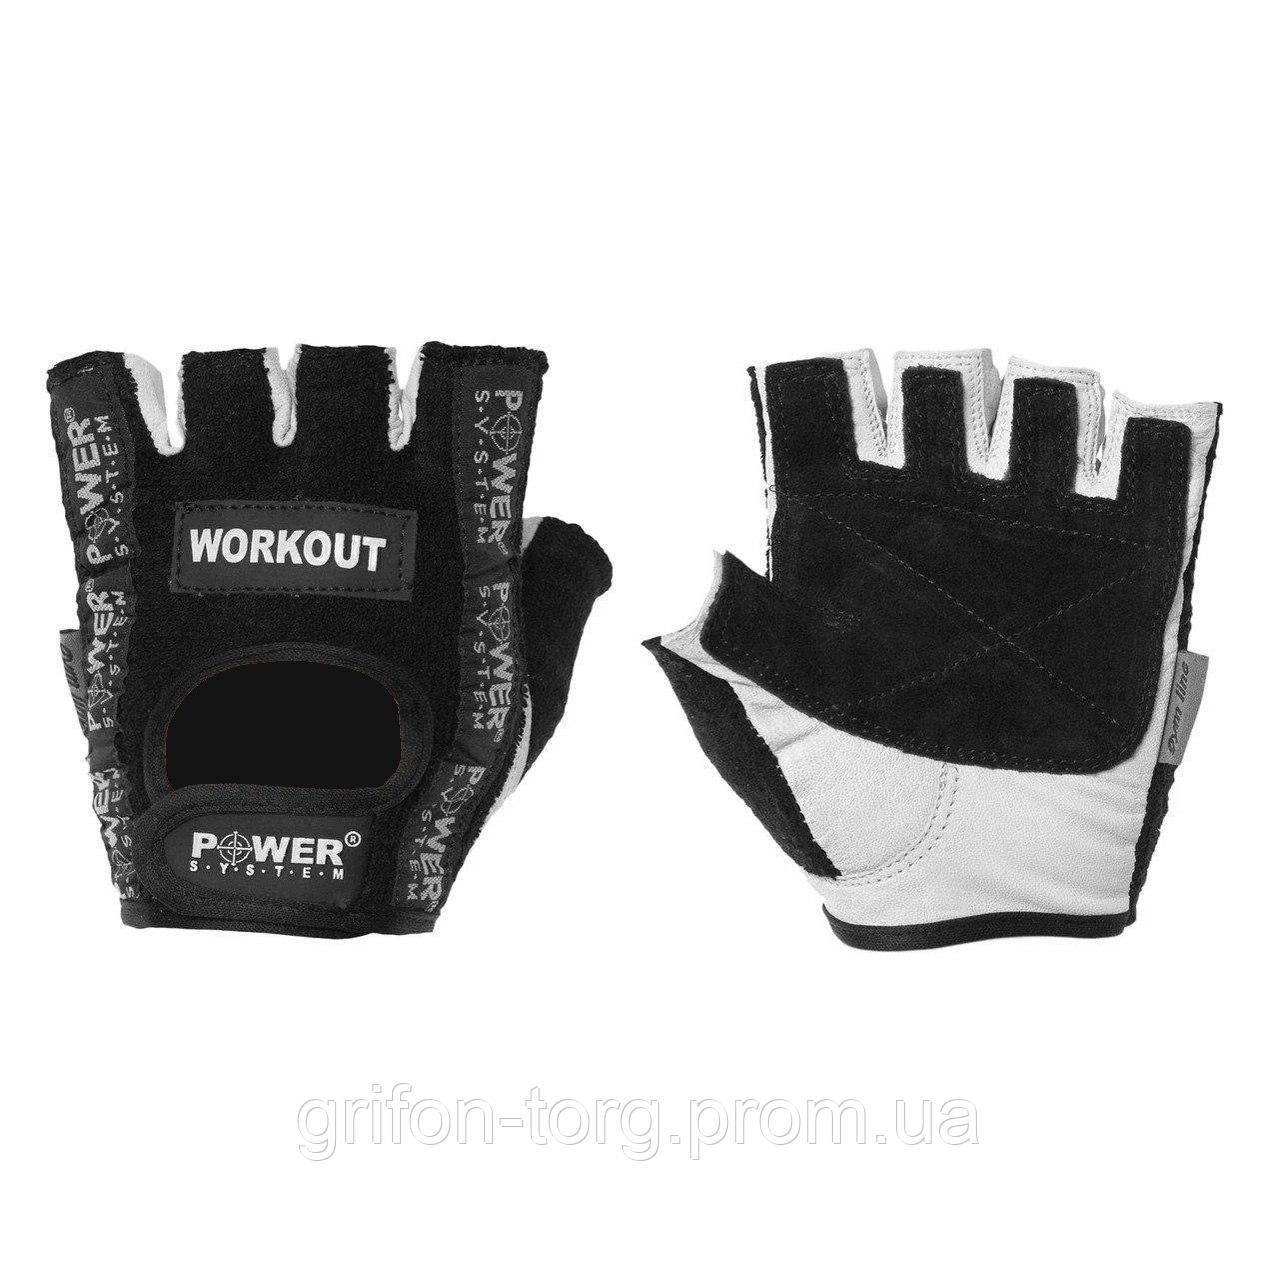 Рукавички для фітнесу і важкої атлетики Power System Workout PS-2200 S Black